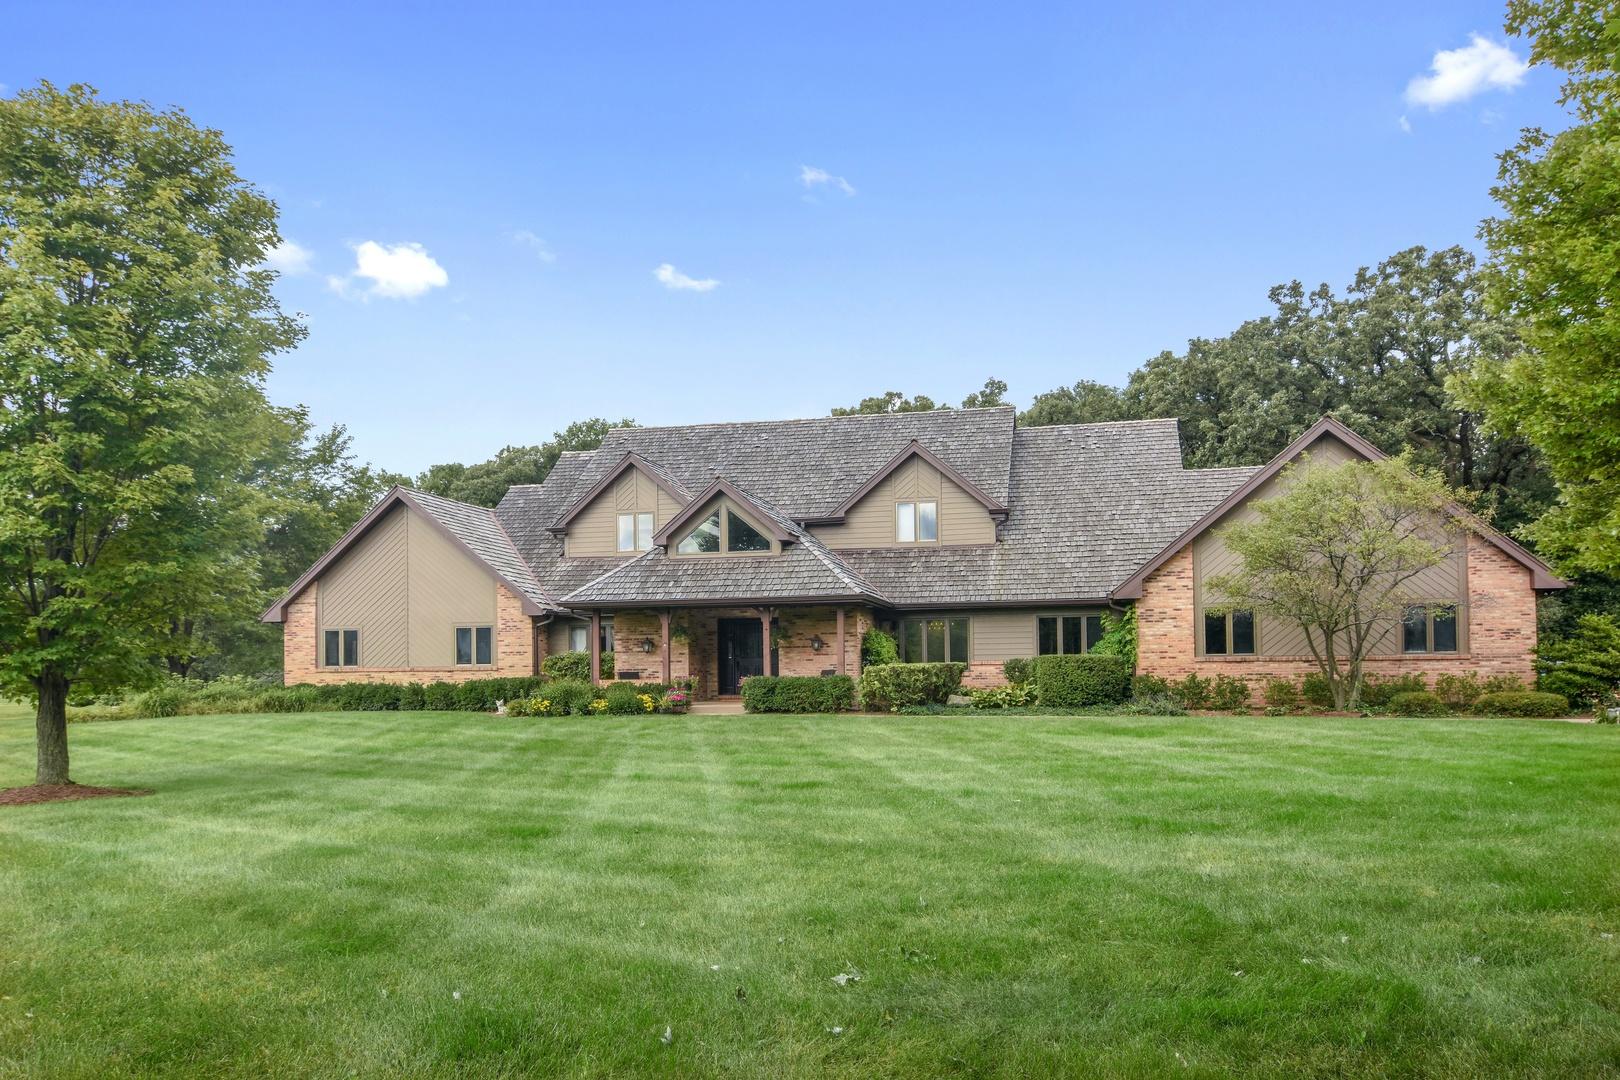 21710 North Hickory Lane, Barrington Hills, Illinois 60010